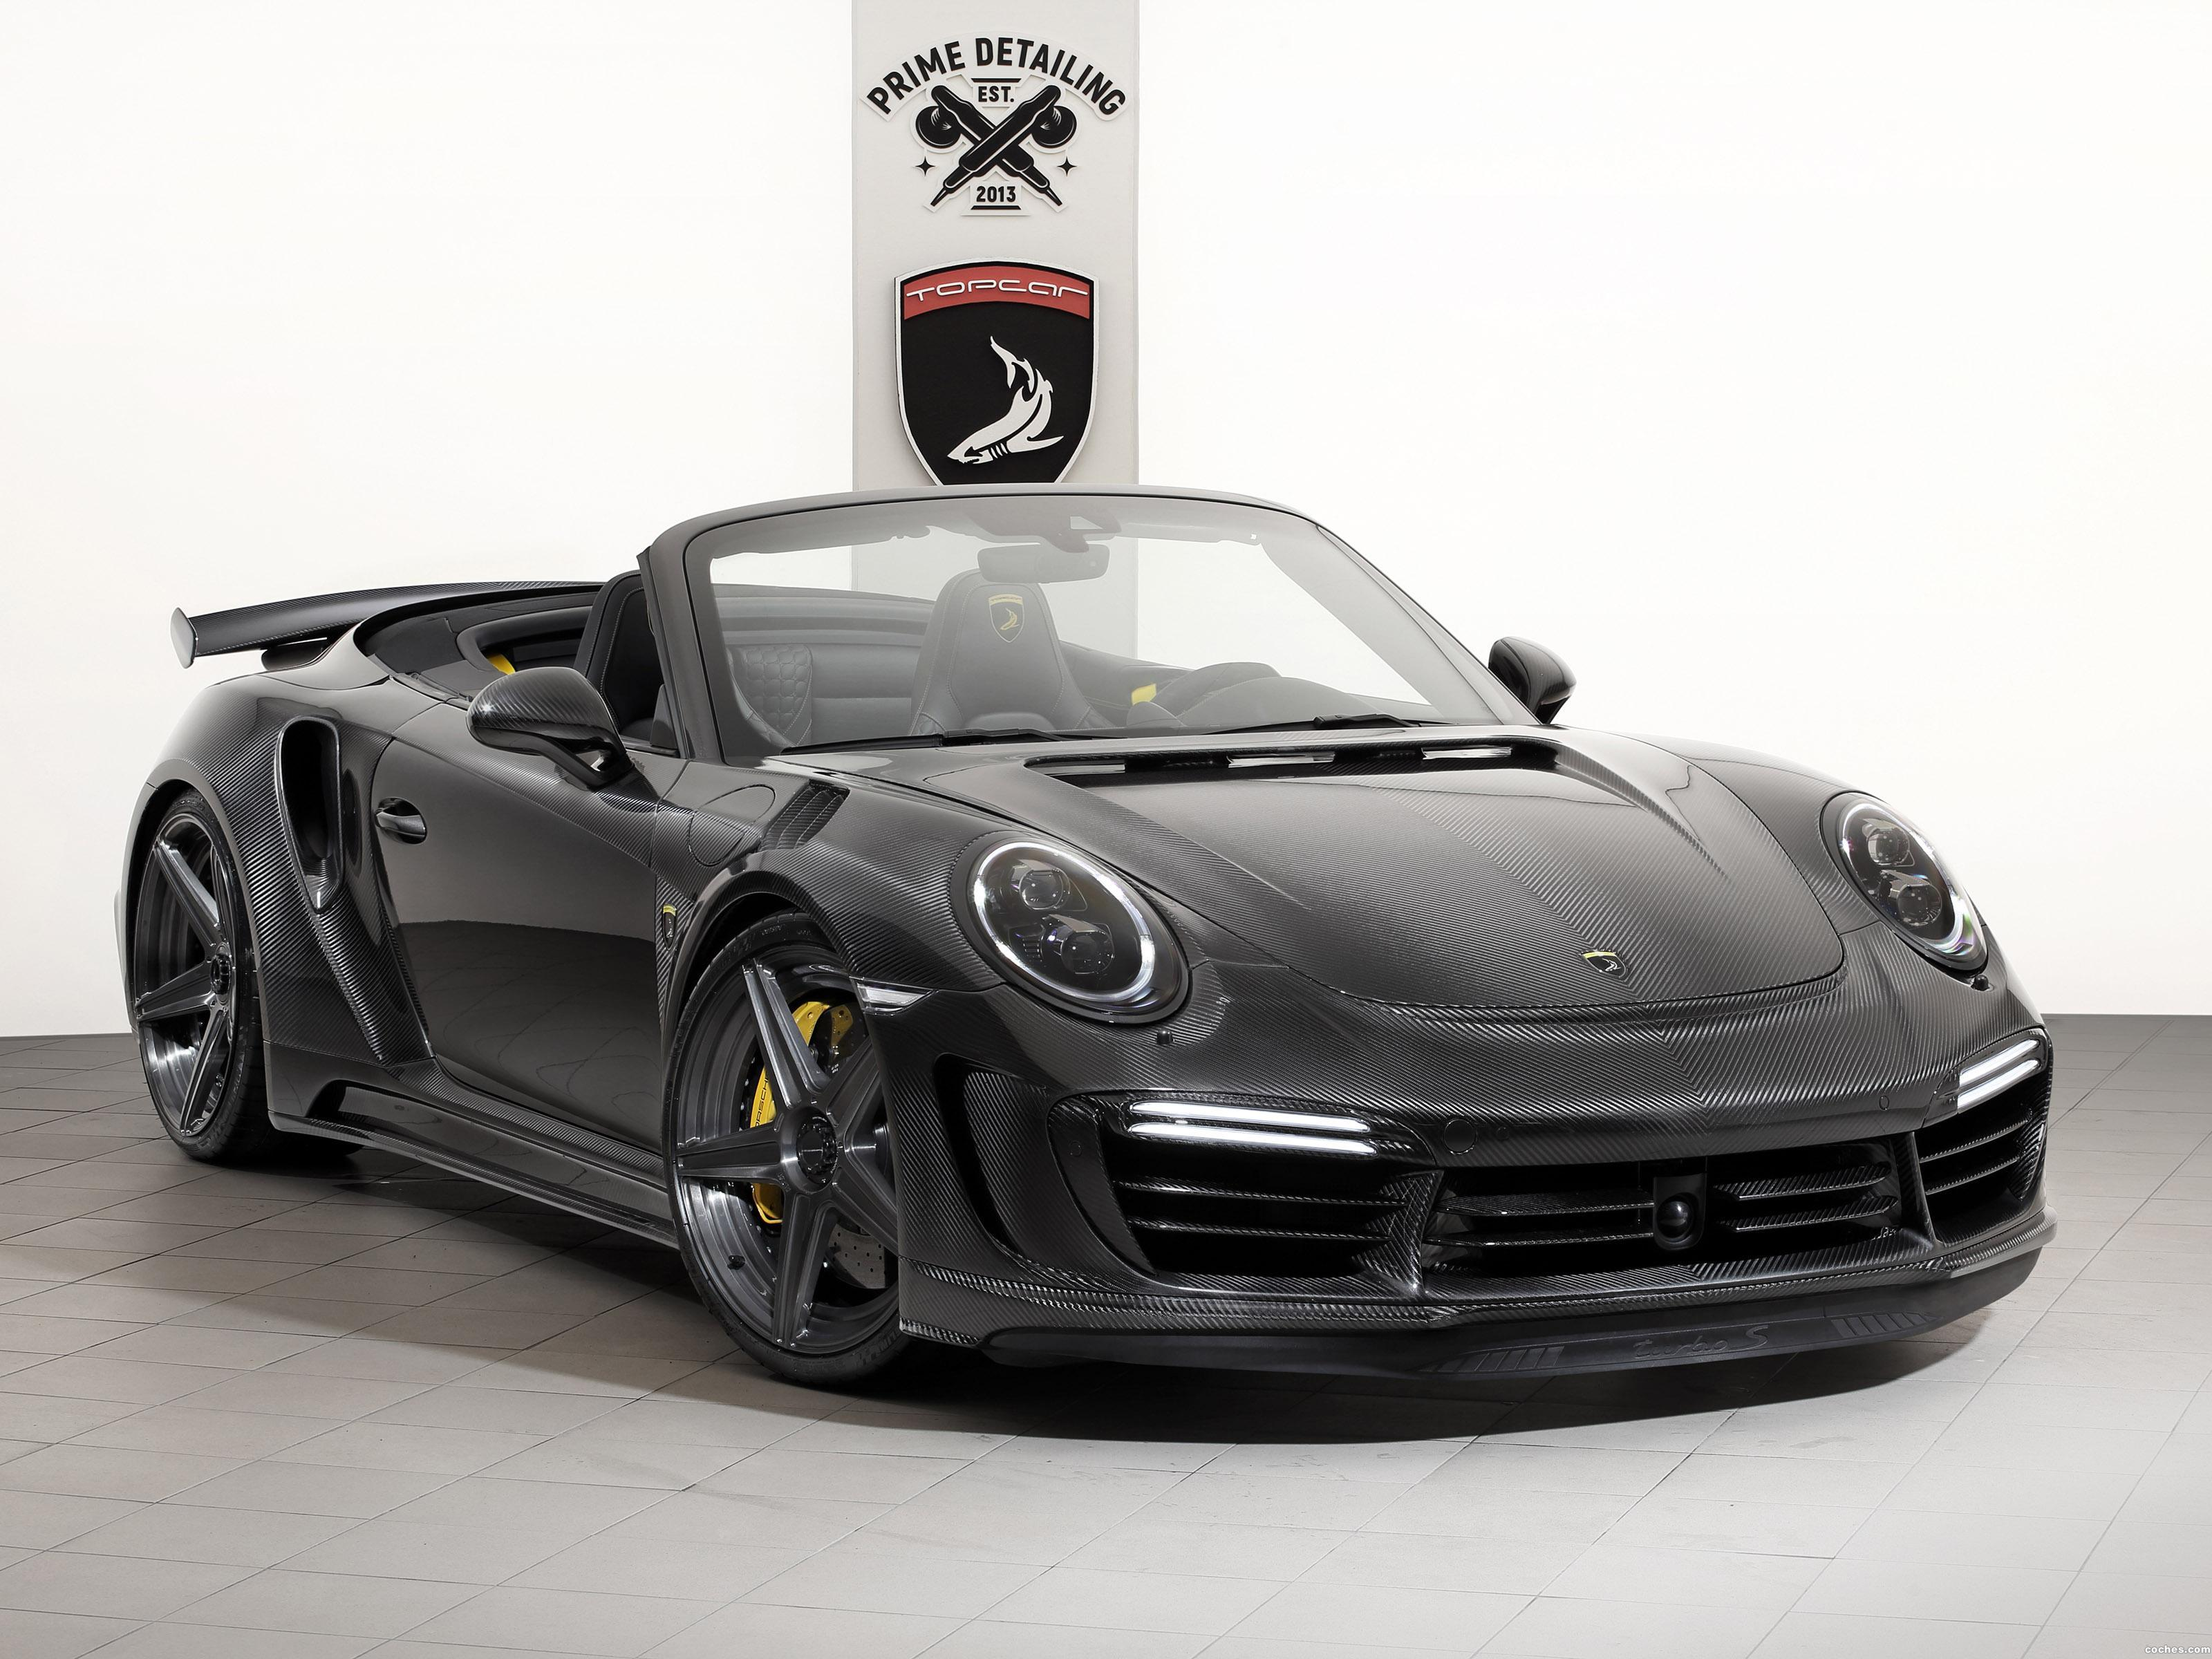 topcar_porsche-911-turbo-stinger-gtr-cabriolet-carbonedition-991-2018_r22.jpg